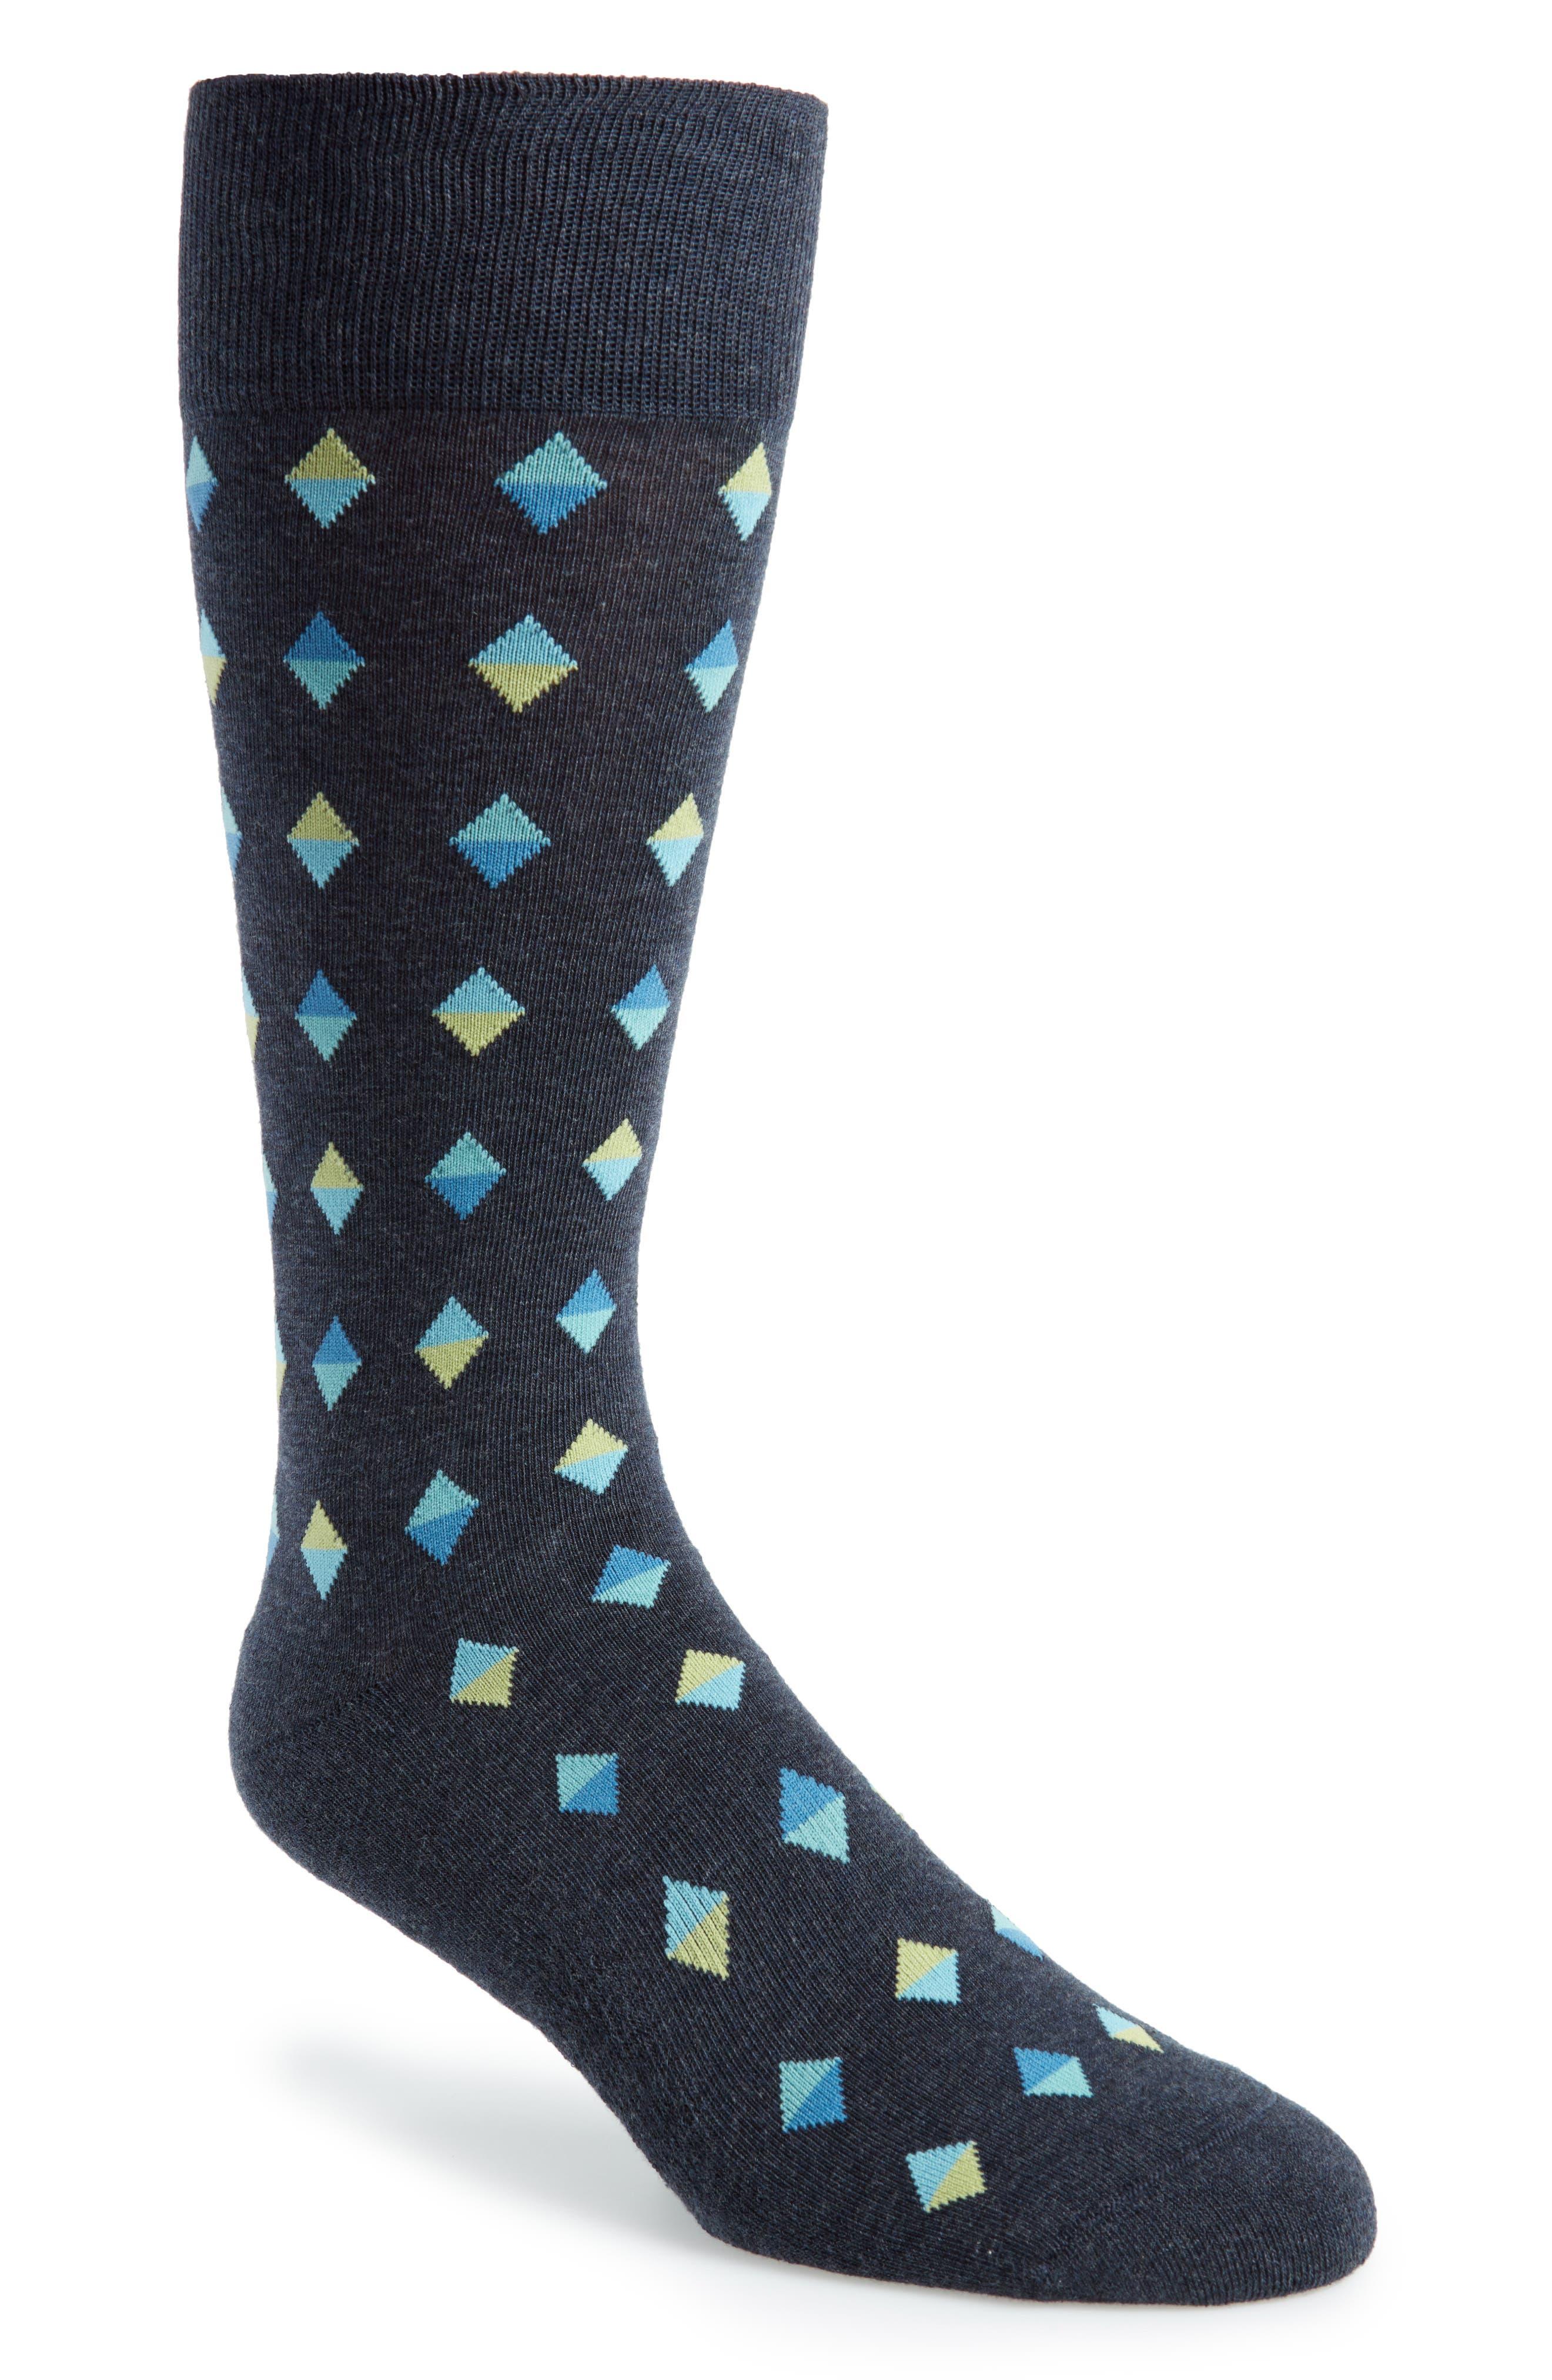 Spliced Diamonds Socks,                         Main,                         color, NAVY/ CHARTREUSE